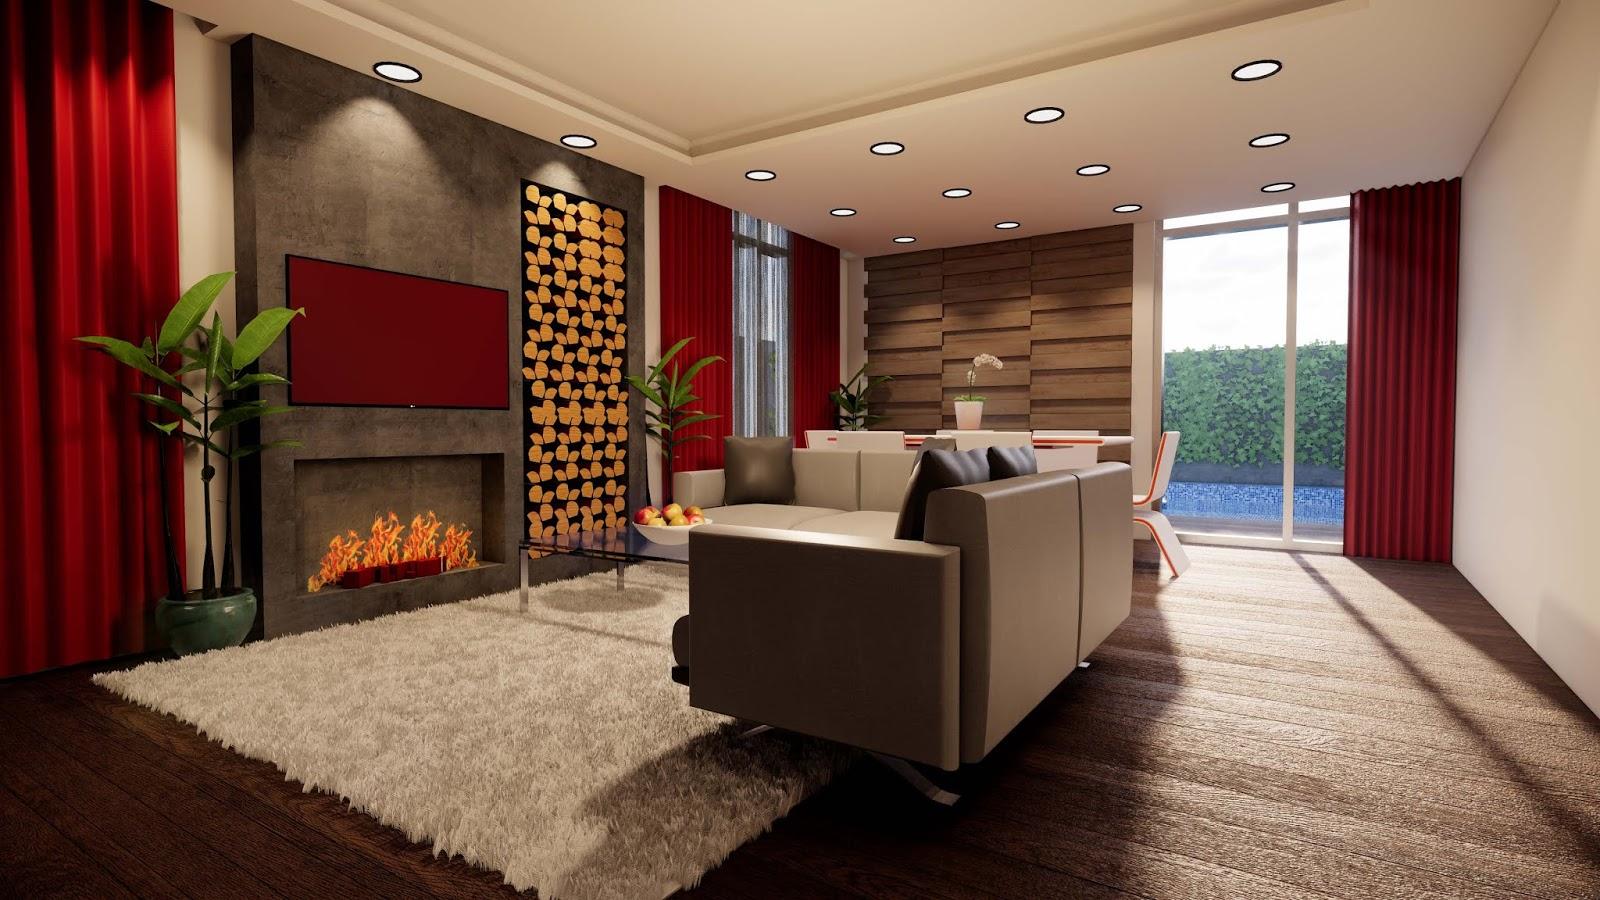 Interior Design For Practice - CAD Needs